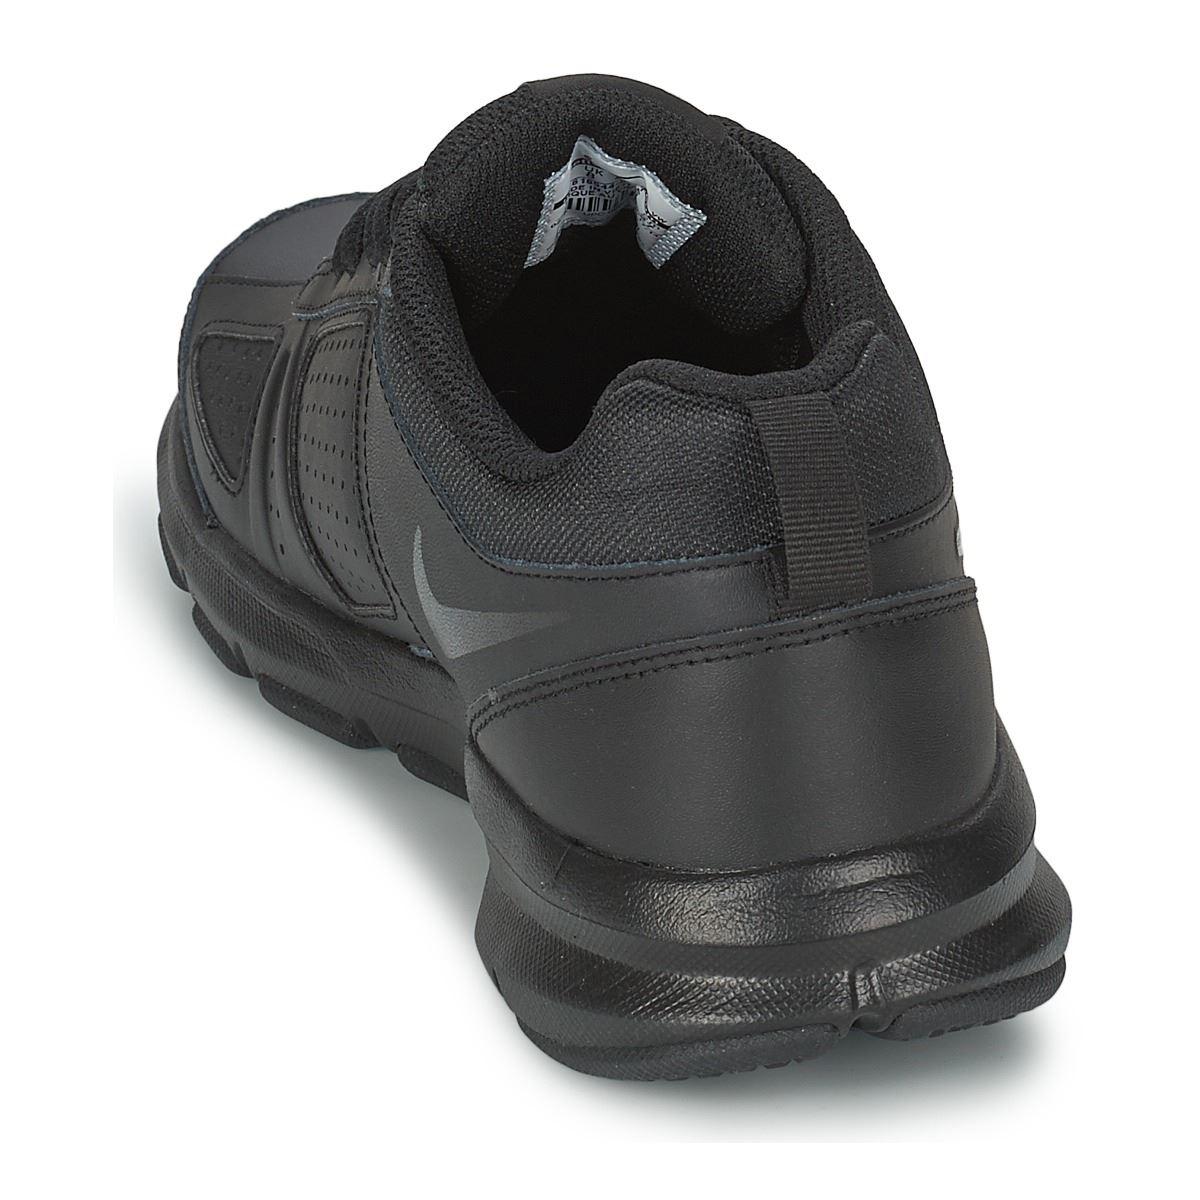 Nike trainers t lite xi women s sneakers sports runing shoes black - Nike Trainers T Lite Xi Women S Sneakers Sports Runing Shoes Black 57